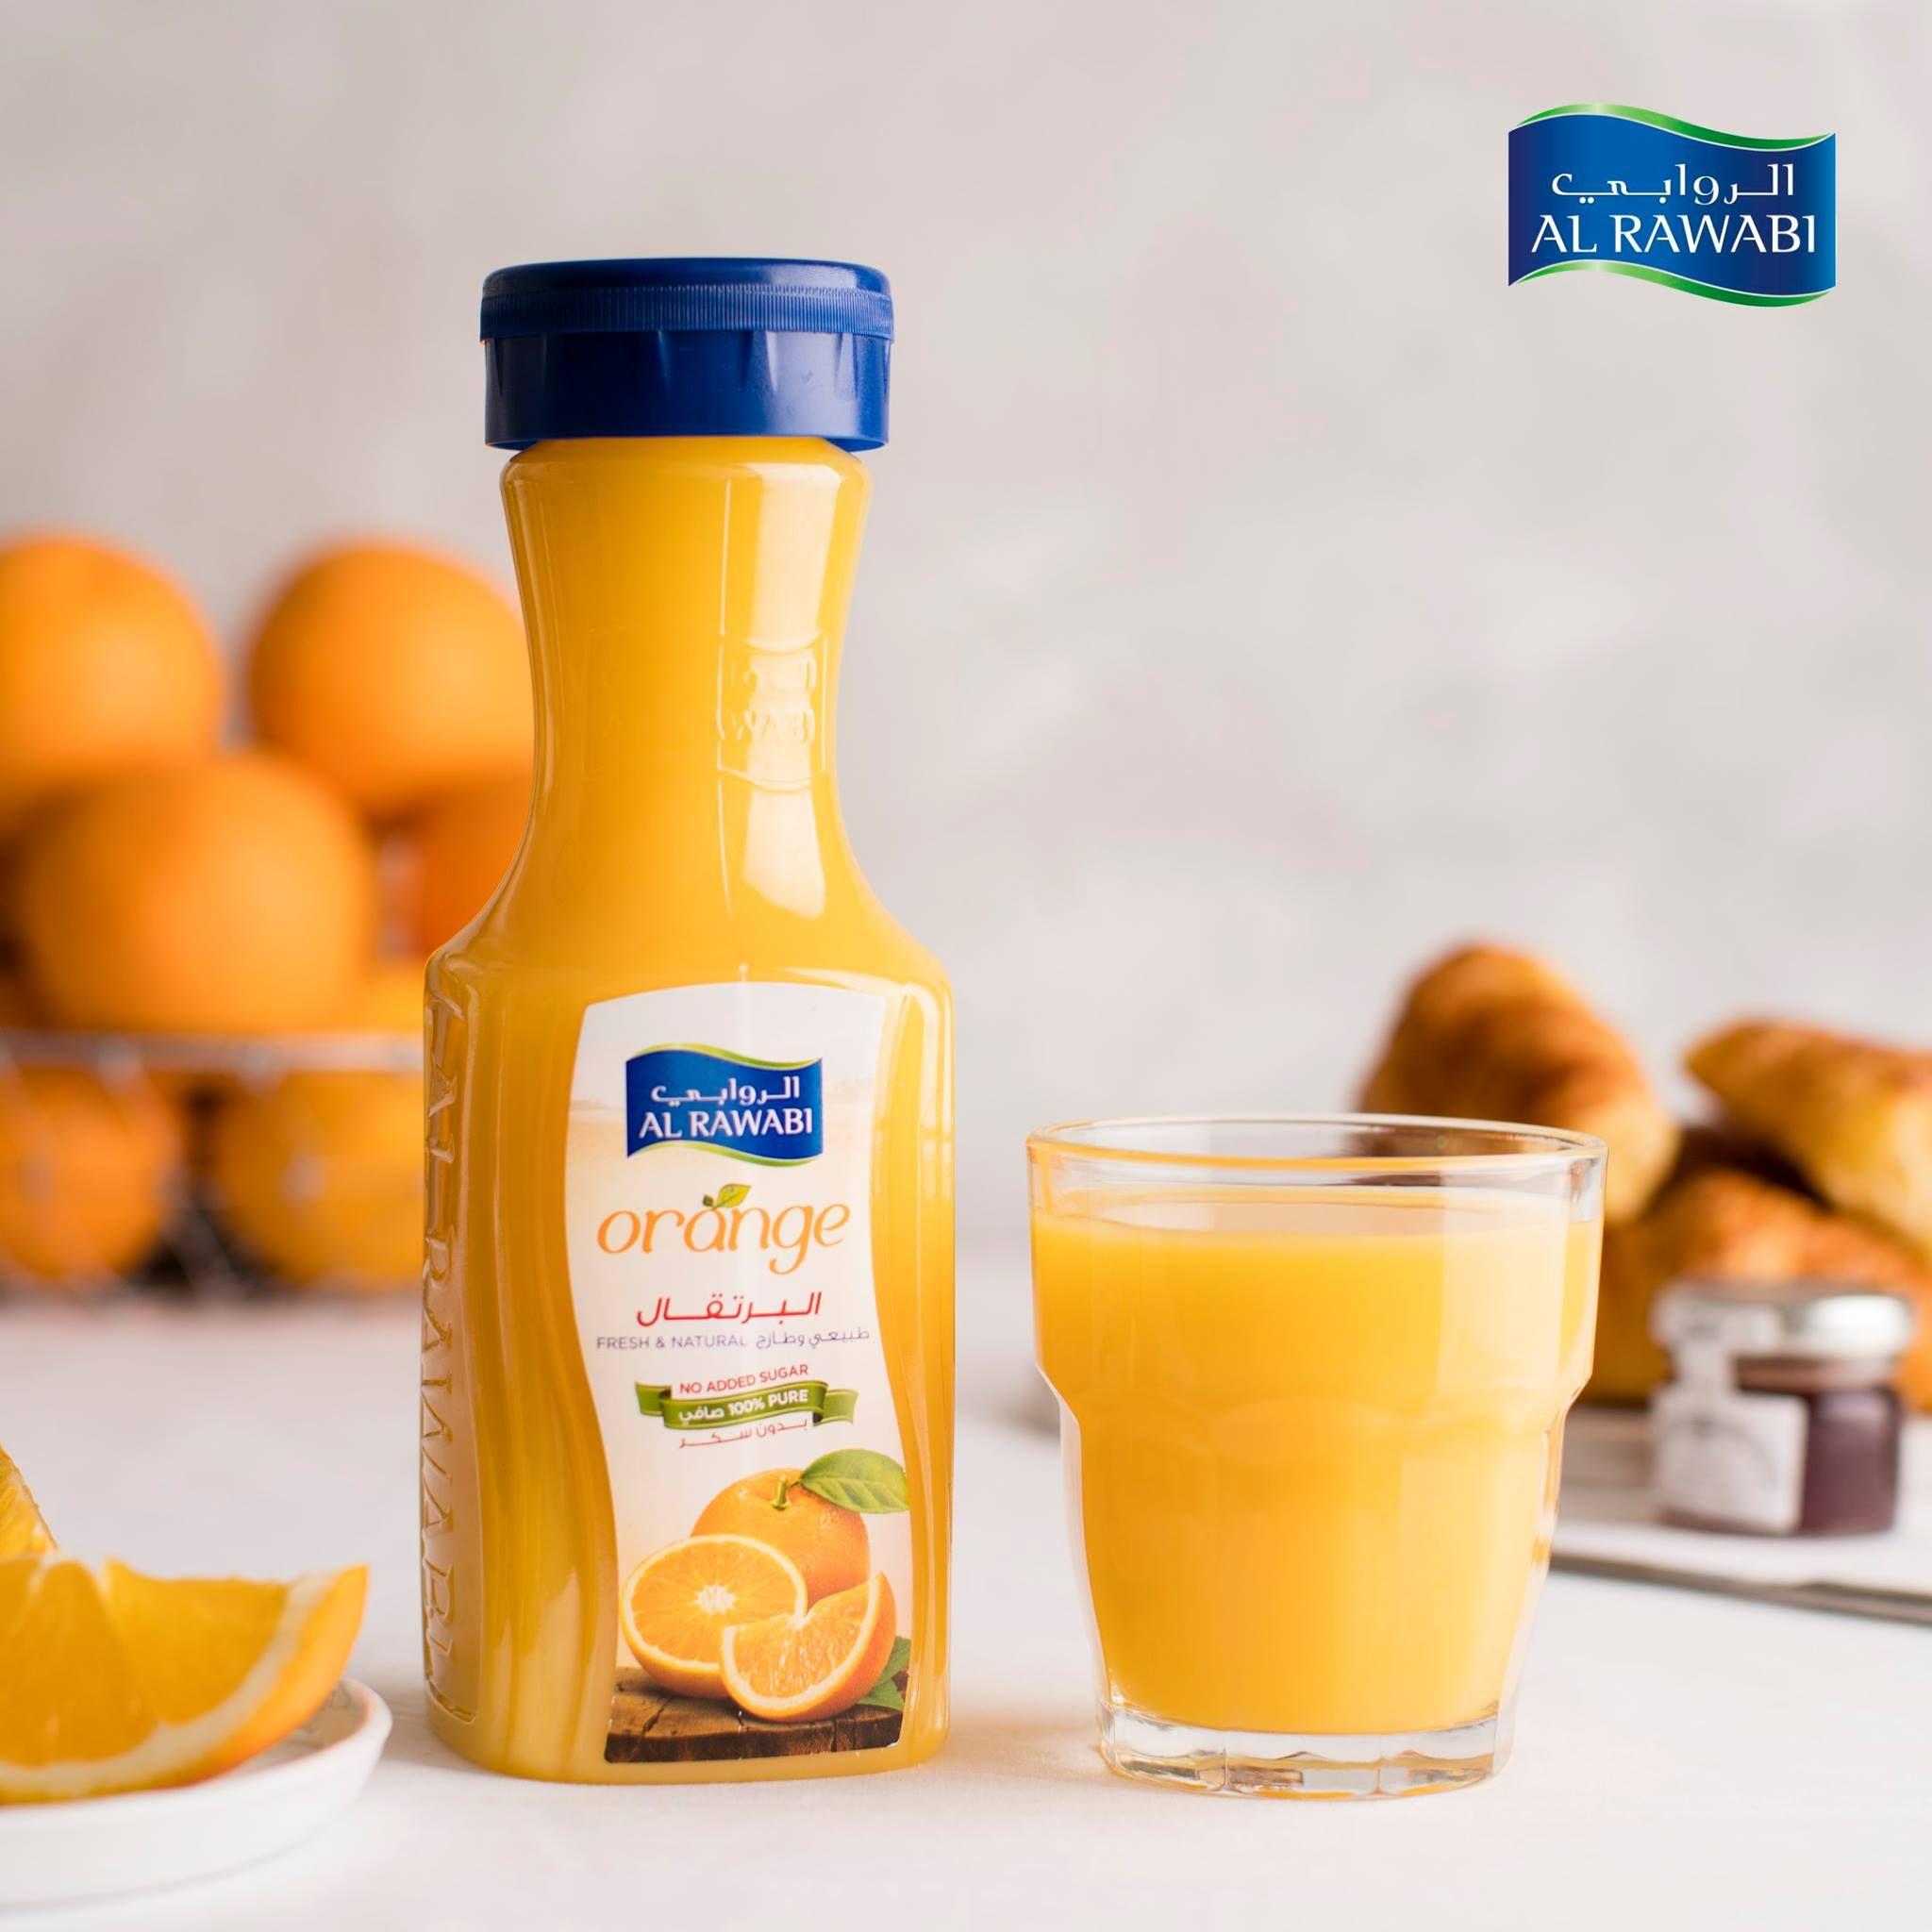 A Glass Of Al Rawabi Orange Juice Everyday Is A Great Way To Get Key Immune System Boosting Nutrients Such As Vitamin C كوب واحد من عص Party Packs Orange Juice